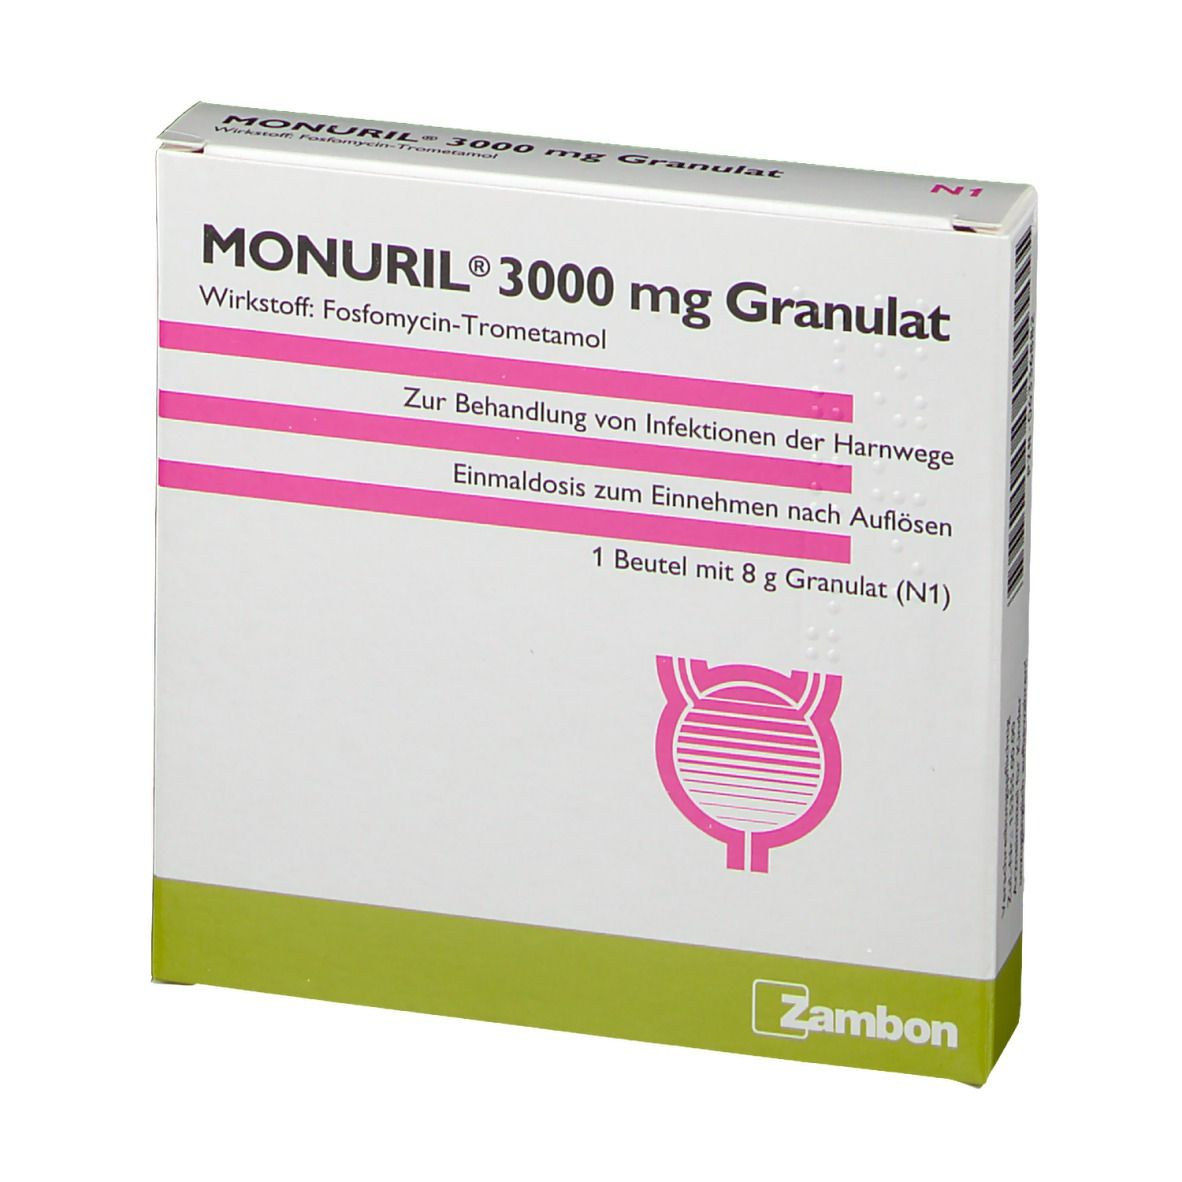 Beipackzettel monuril Fachinformation Monuril